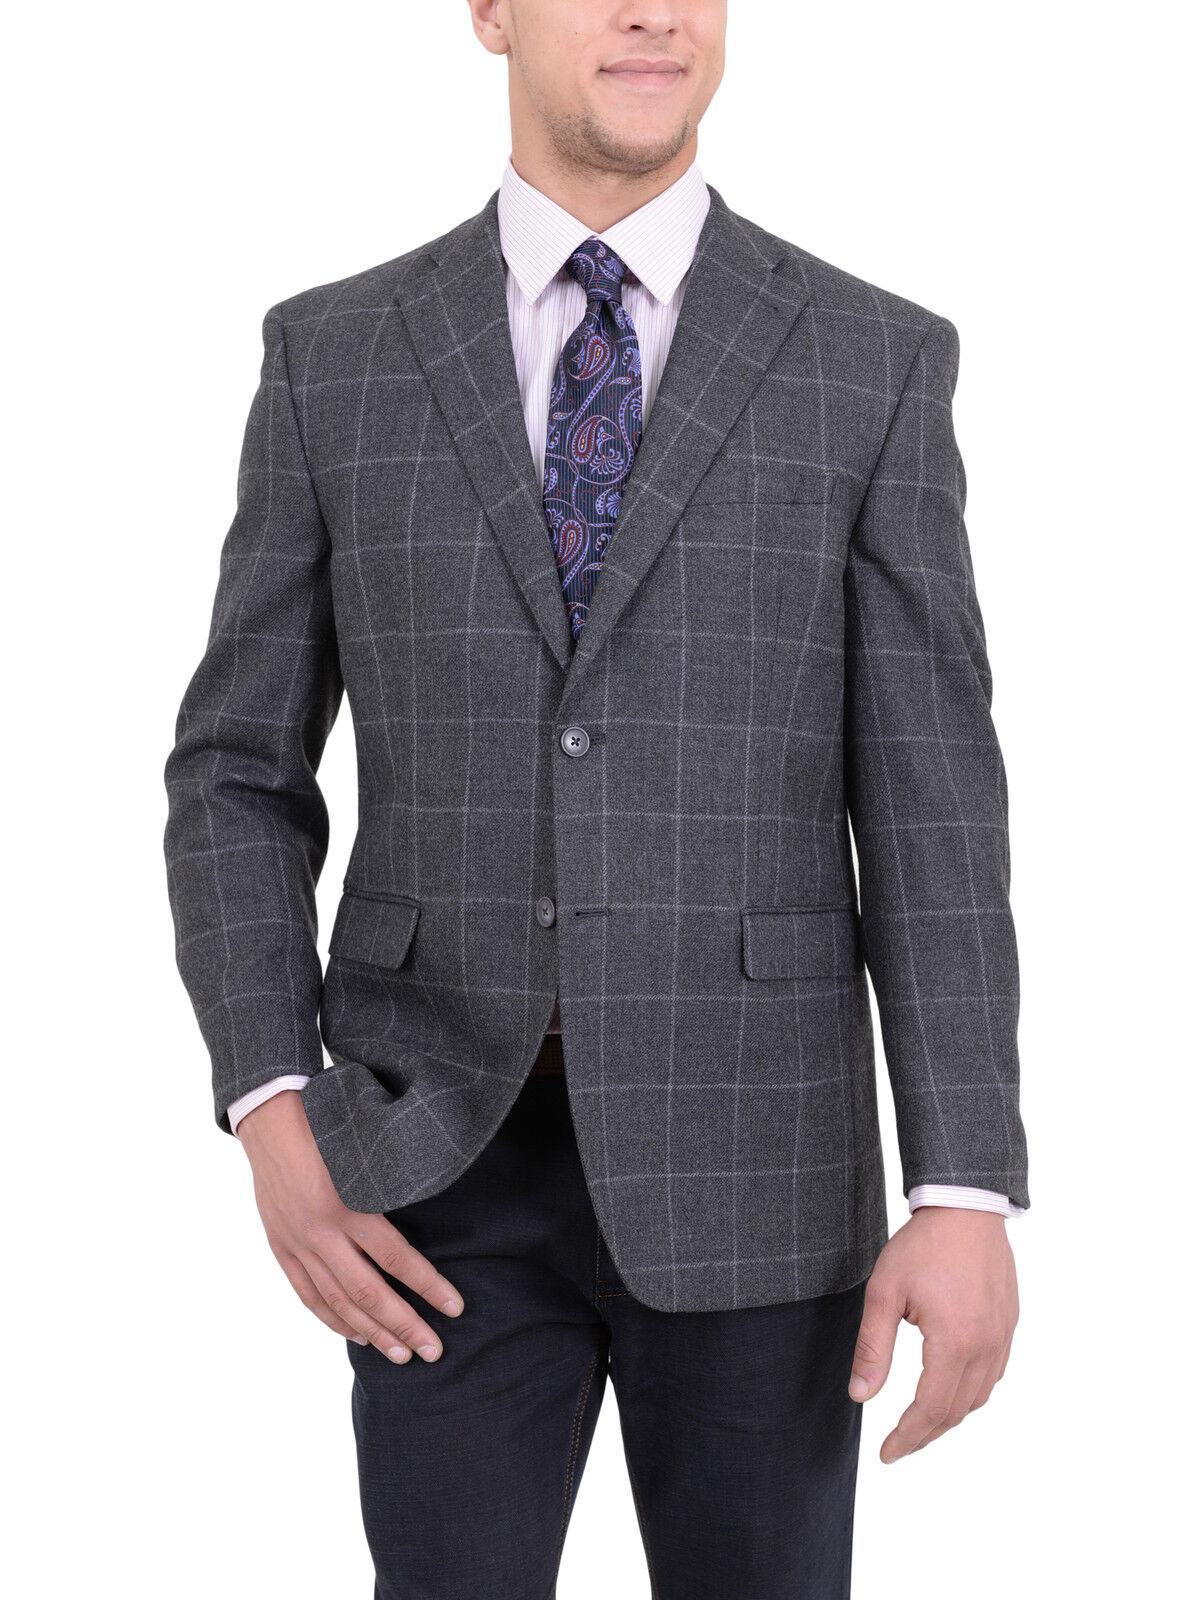 Ital  Herren Classic Fit grau Windowpane Flannel Wool Blazer Sportcoat